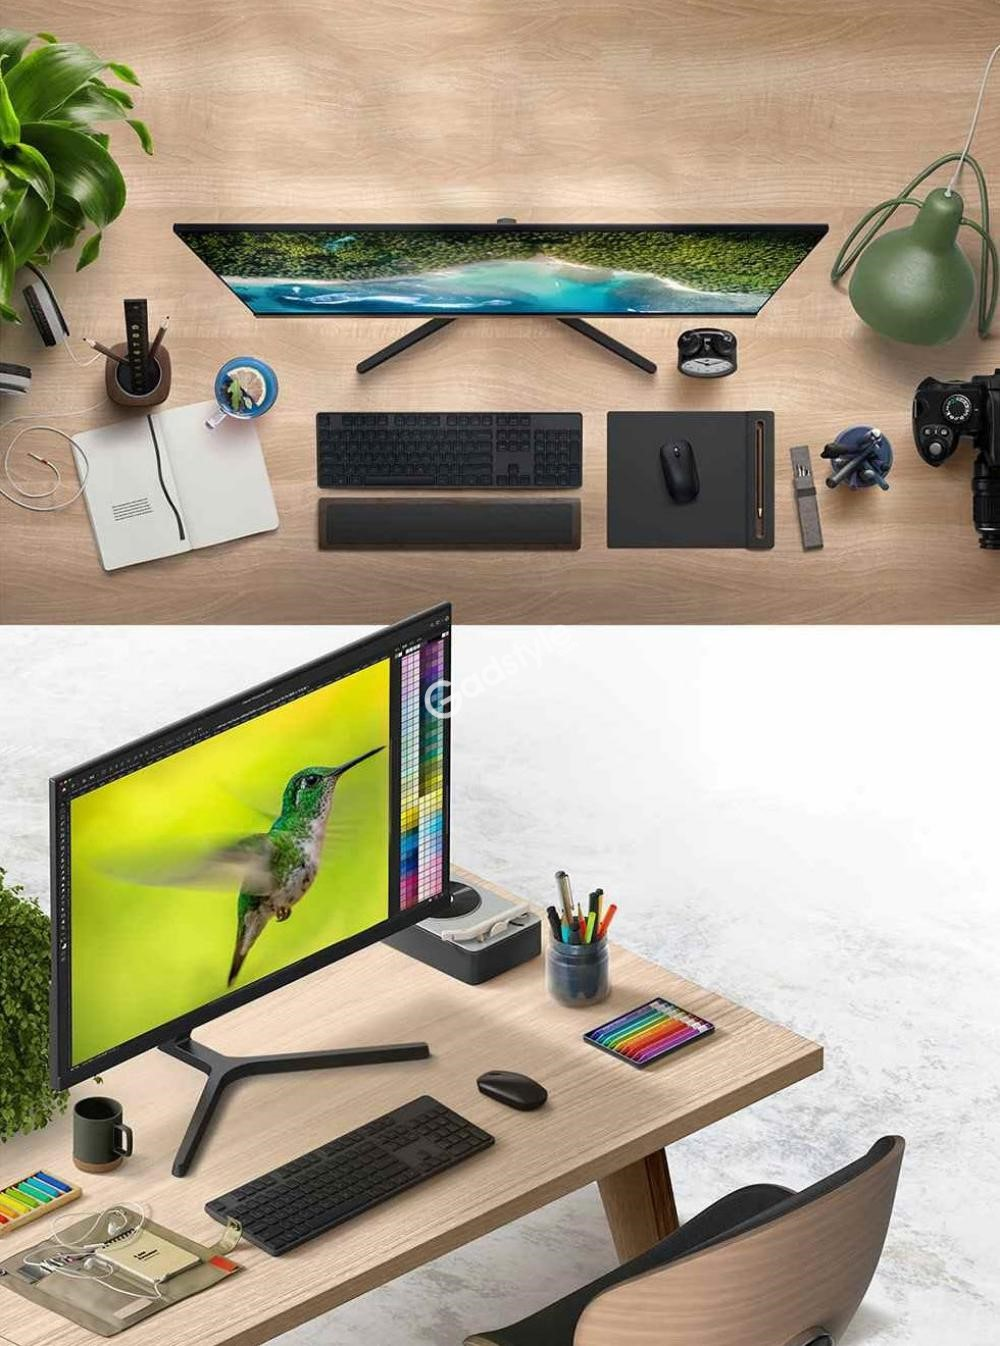 Xiaomi Mi Desktop Monitor 1c 23 8 Full Hd (2)